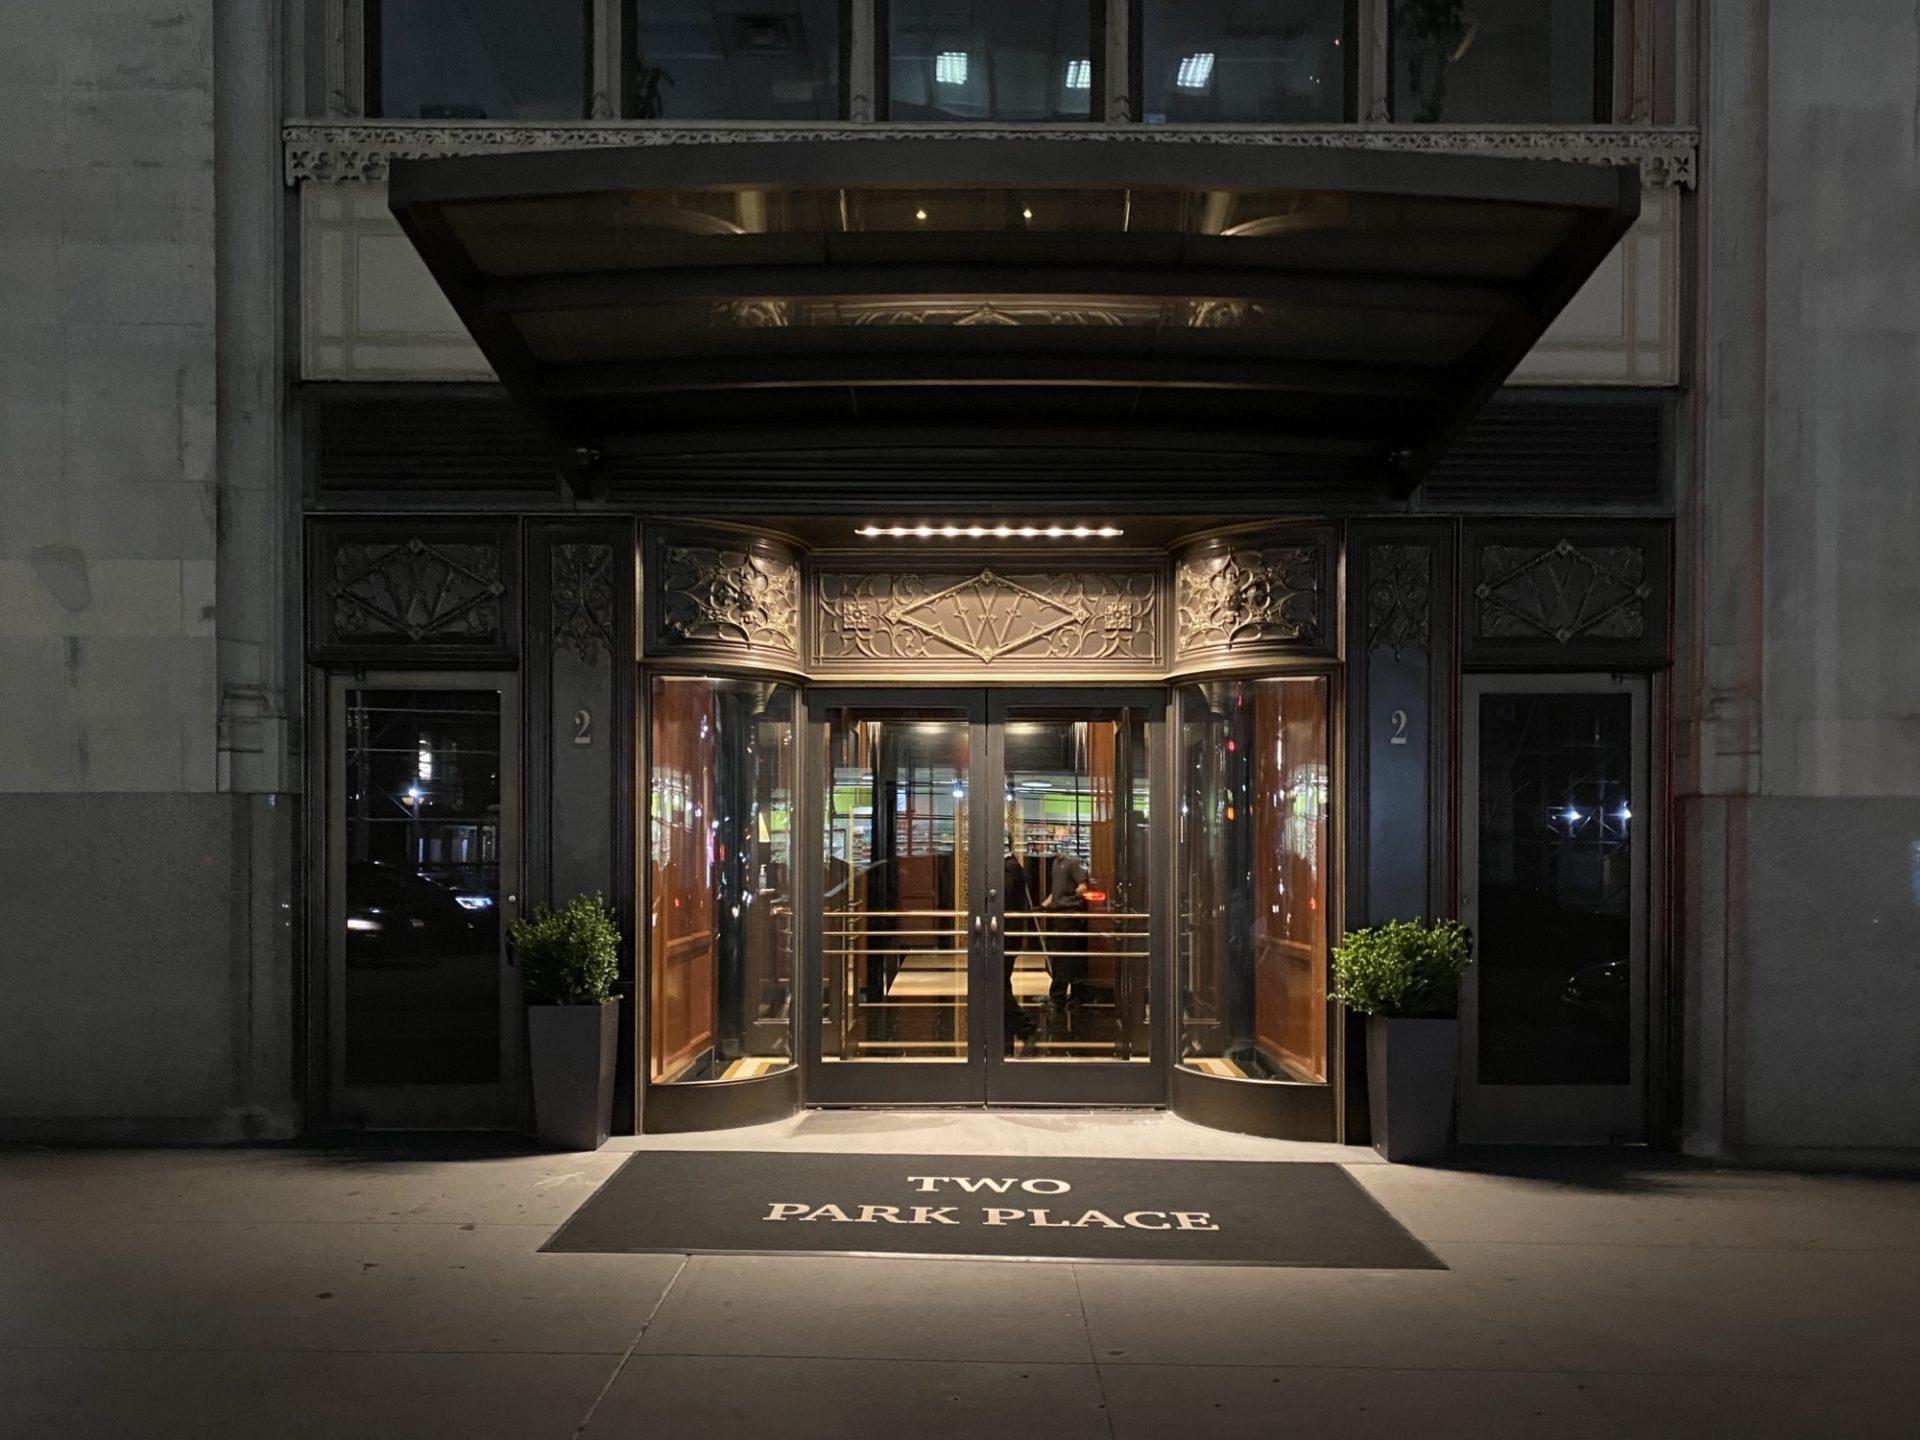 Doorman Building Expectations in New York City